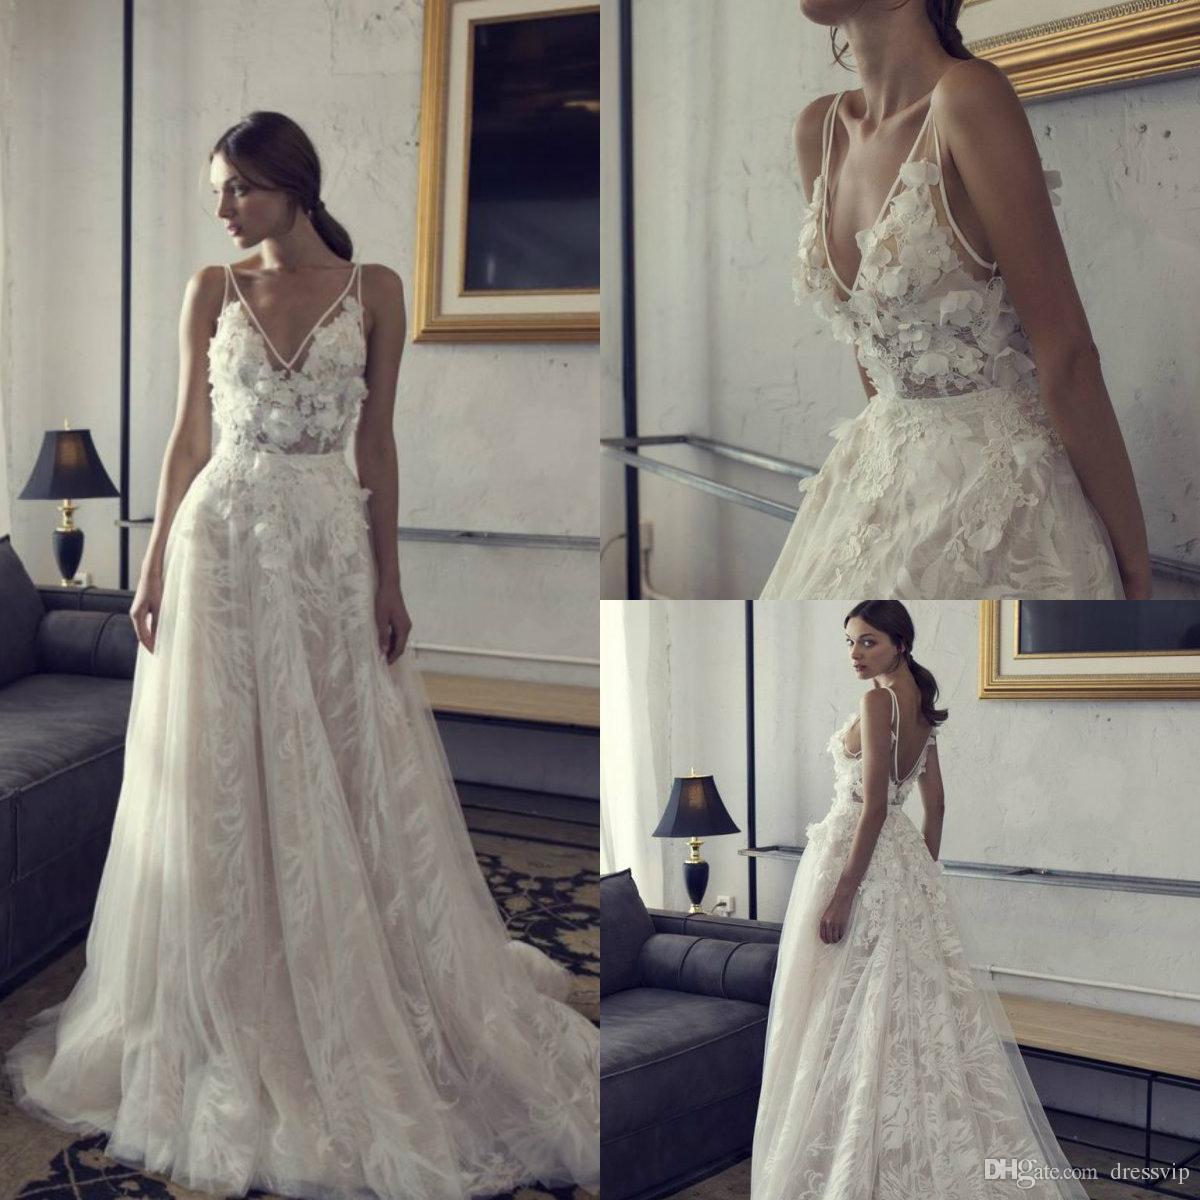 Boho Blush Pink Wedding Dresses 2017 Pretty 3d Flower Lace: Großhandel 2018 V Ausschnitt Boho Brautkleider Backless A